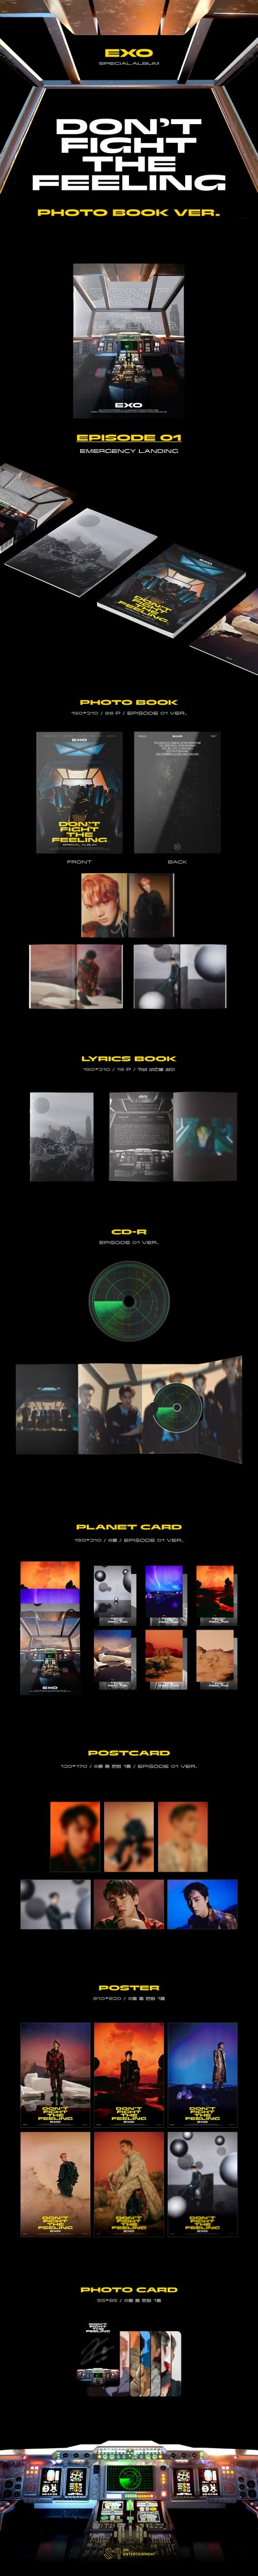 EXO、韓国スペシャルアルバム『DON'T FIGHT THE FEELING』